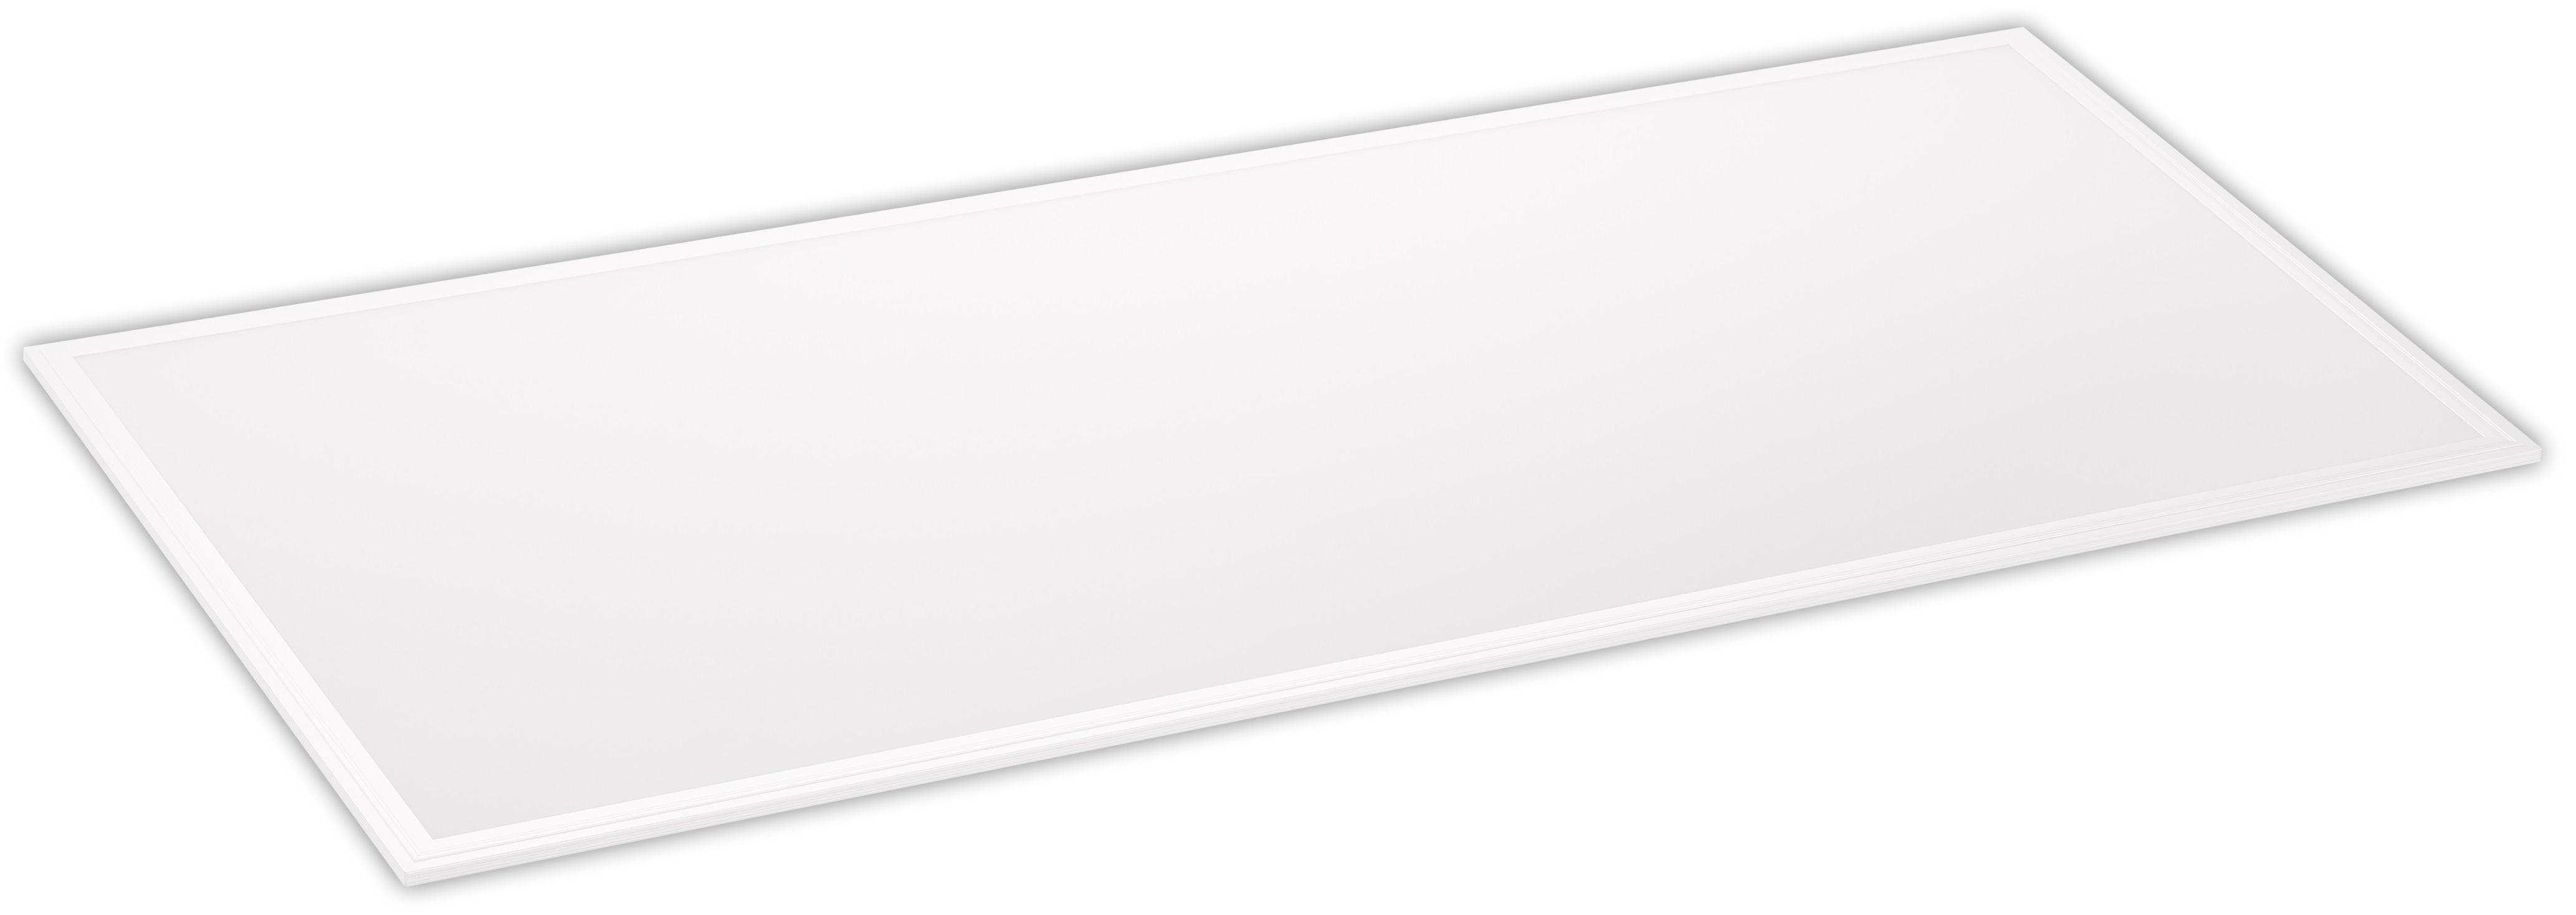 LED Panel 42W, 3600lm, 830, 1197x297mm, 1050mA, ohne Treiber